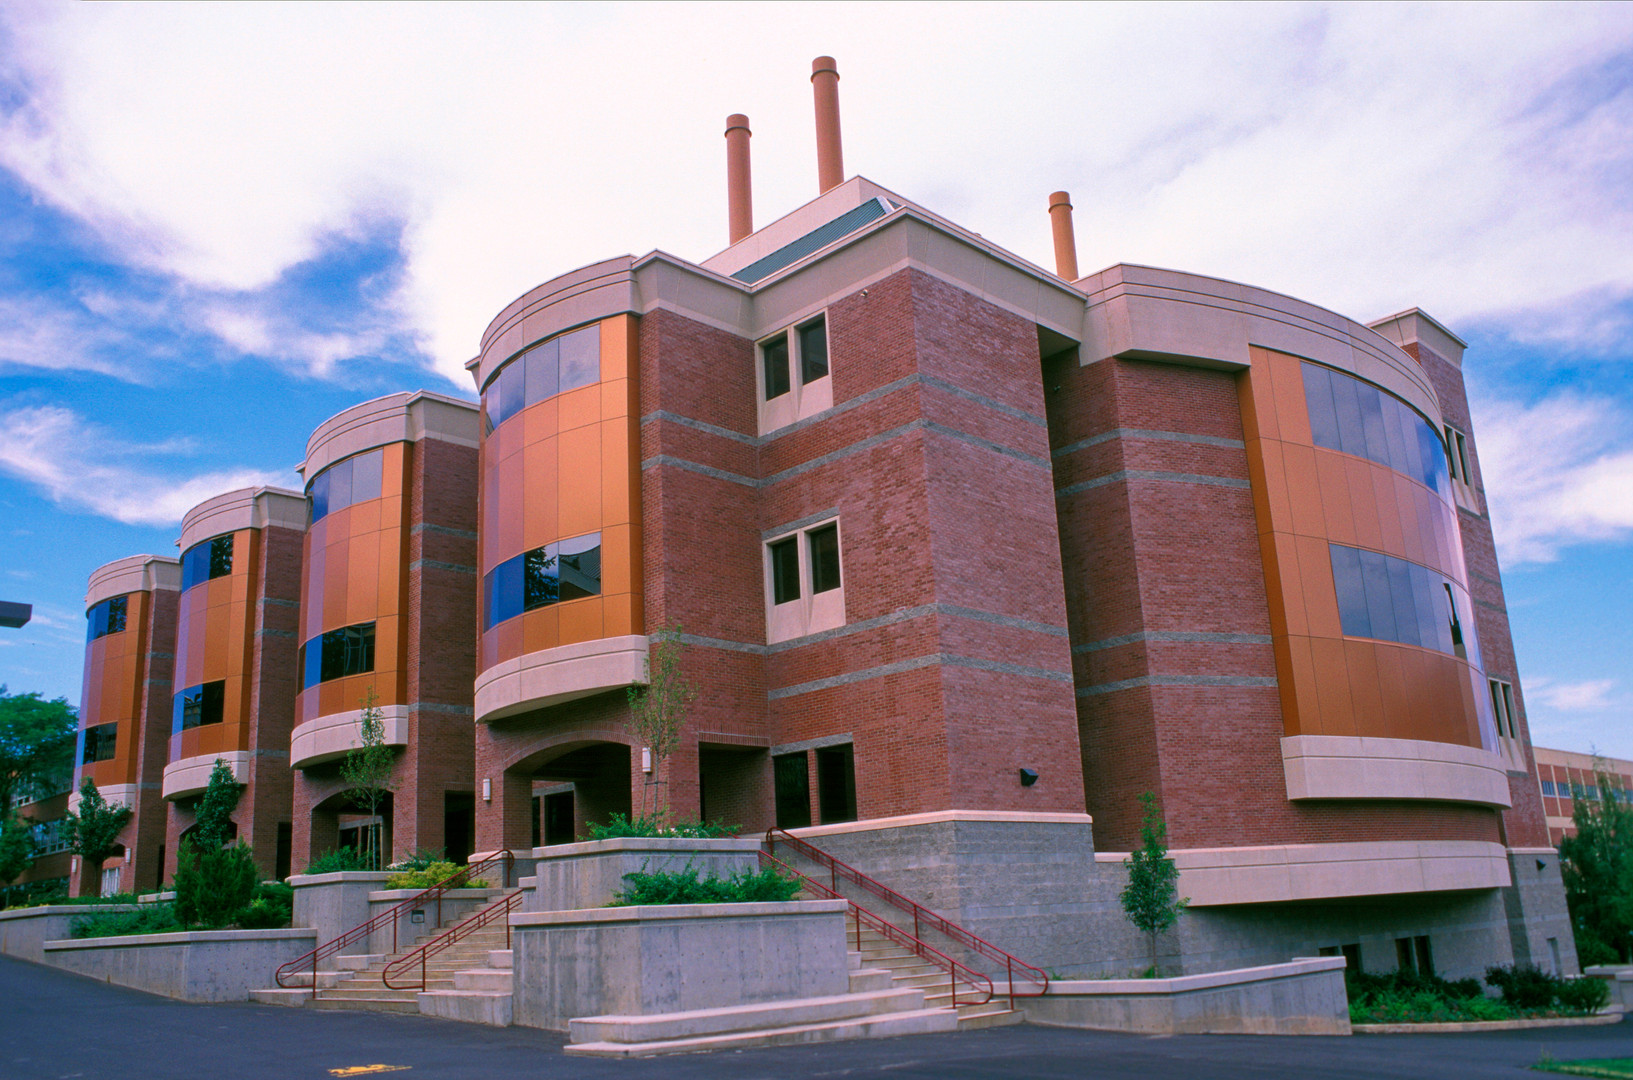 Mcclure University of Idaho.jpg